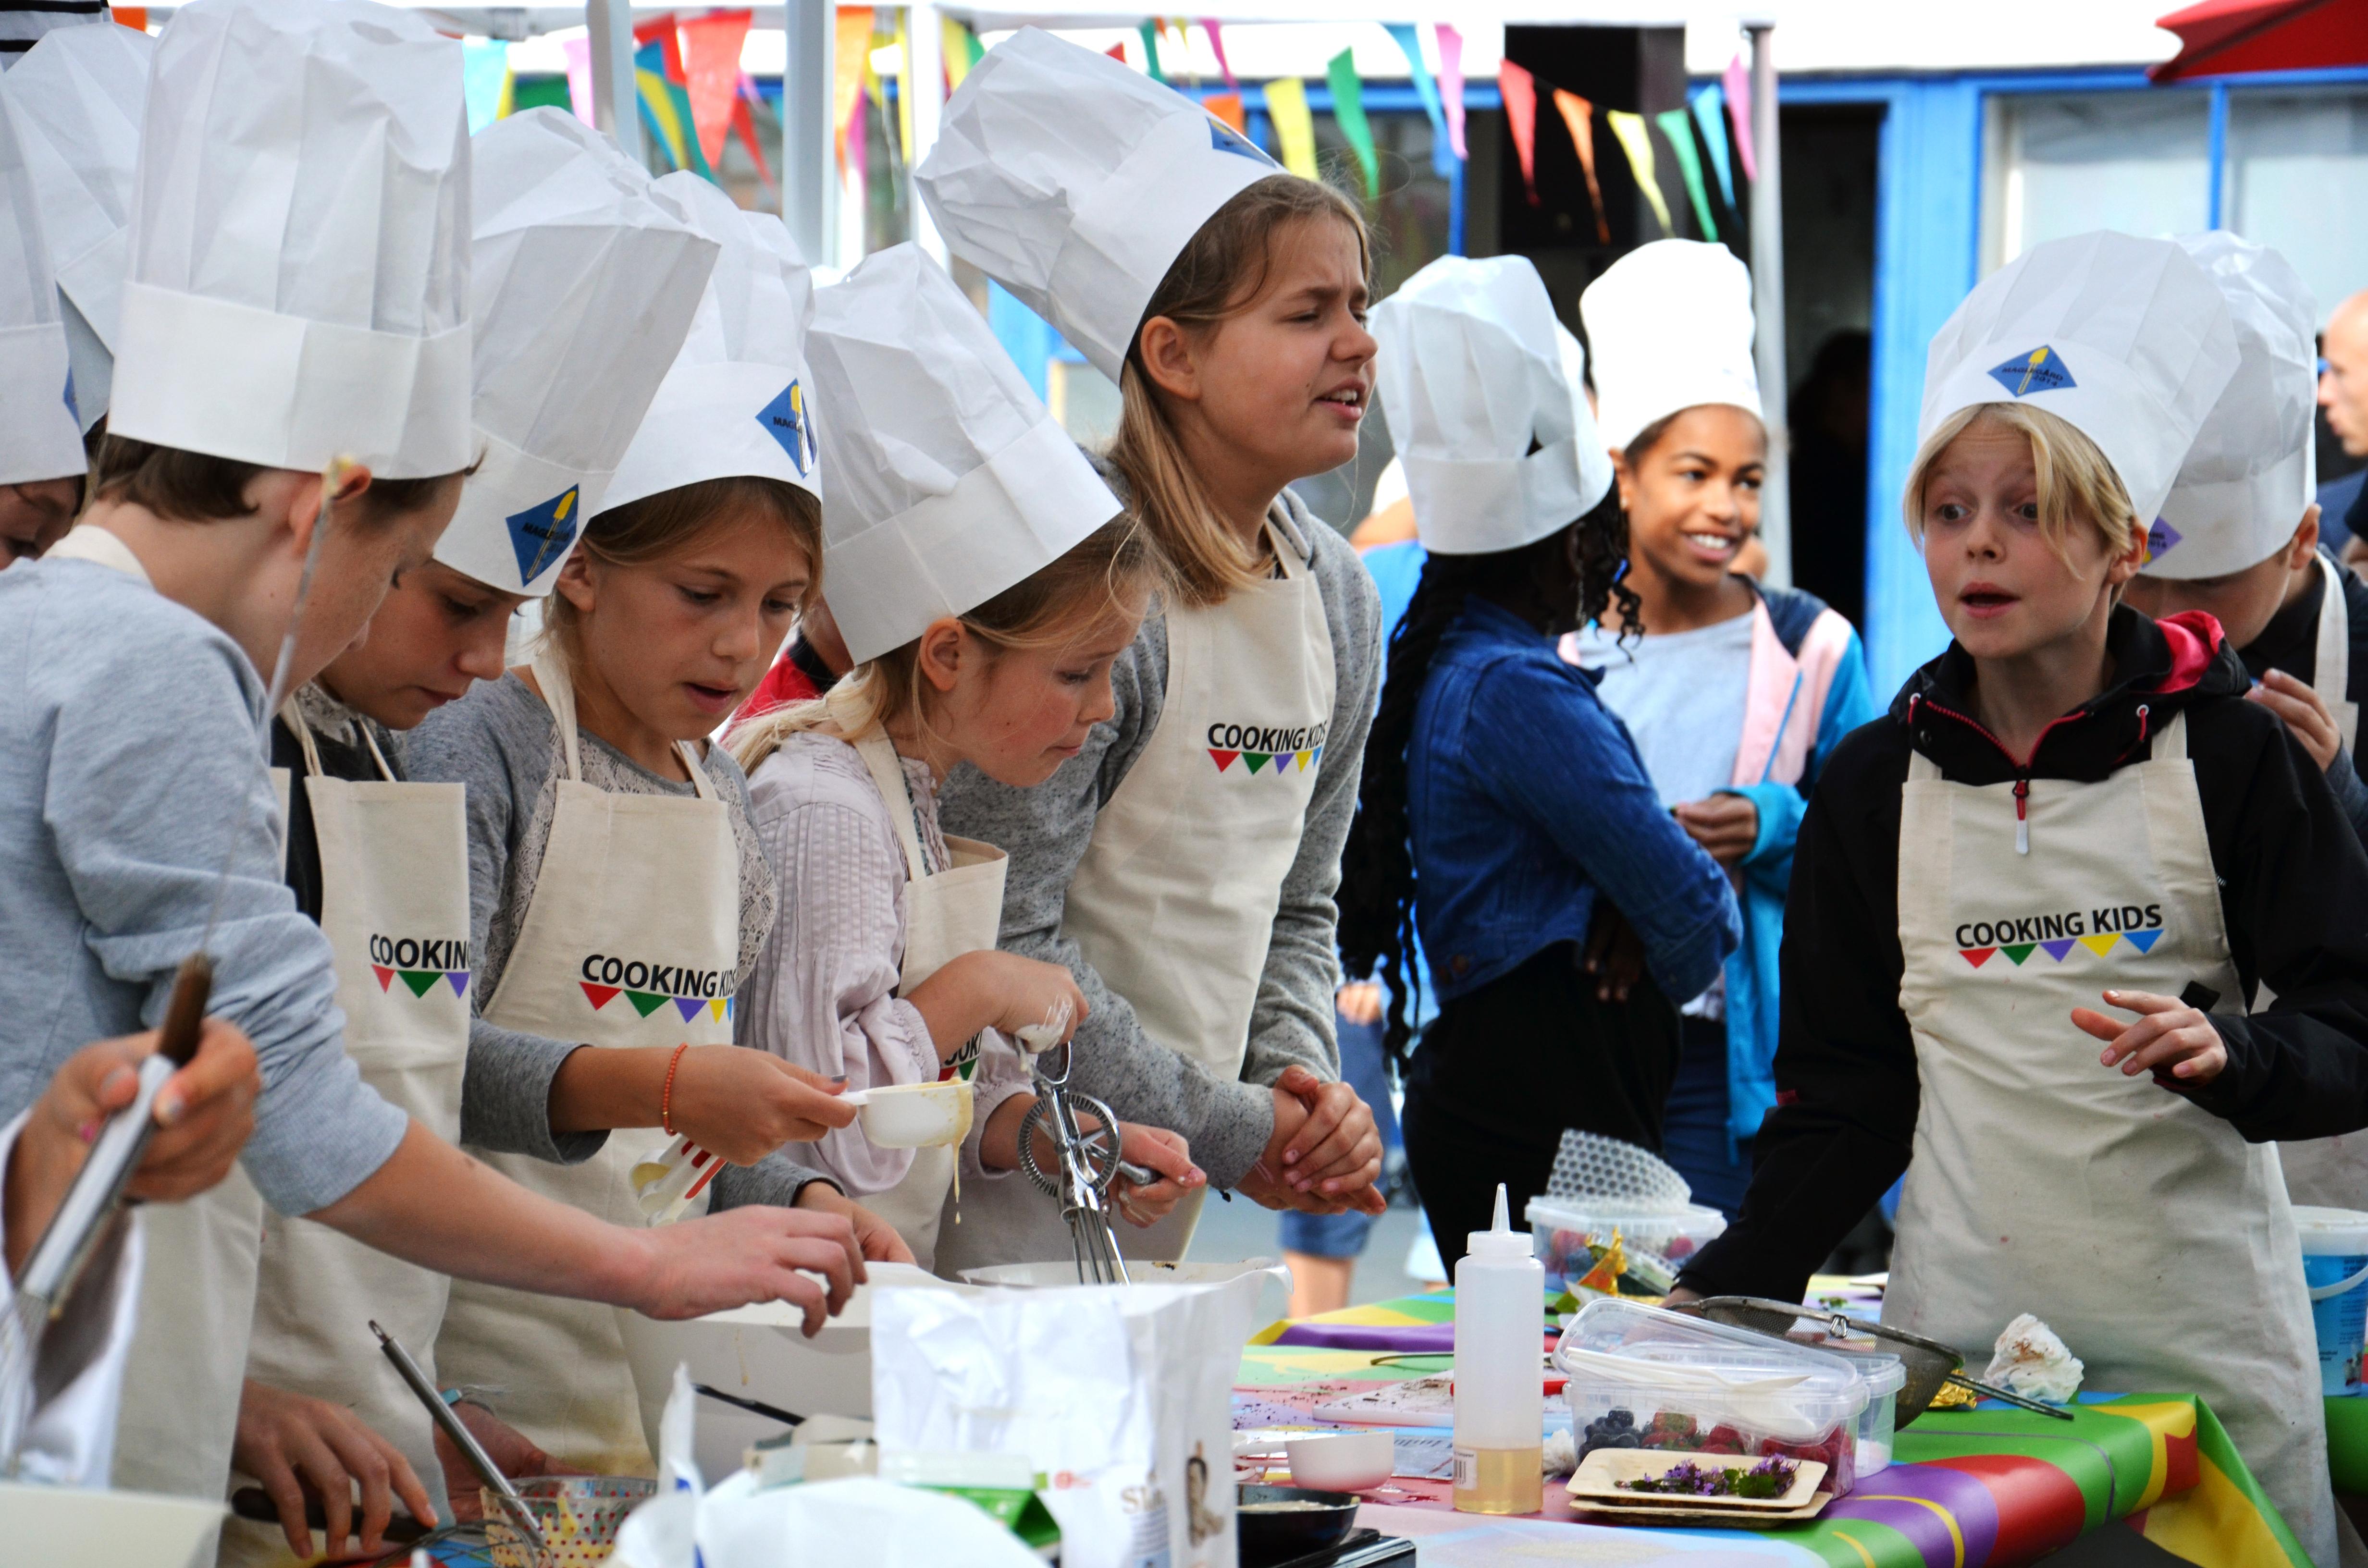 6 kids cooking